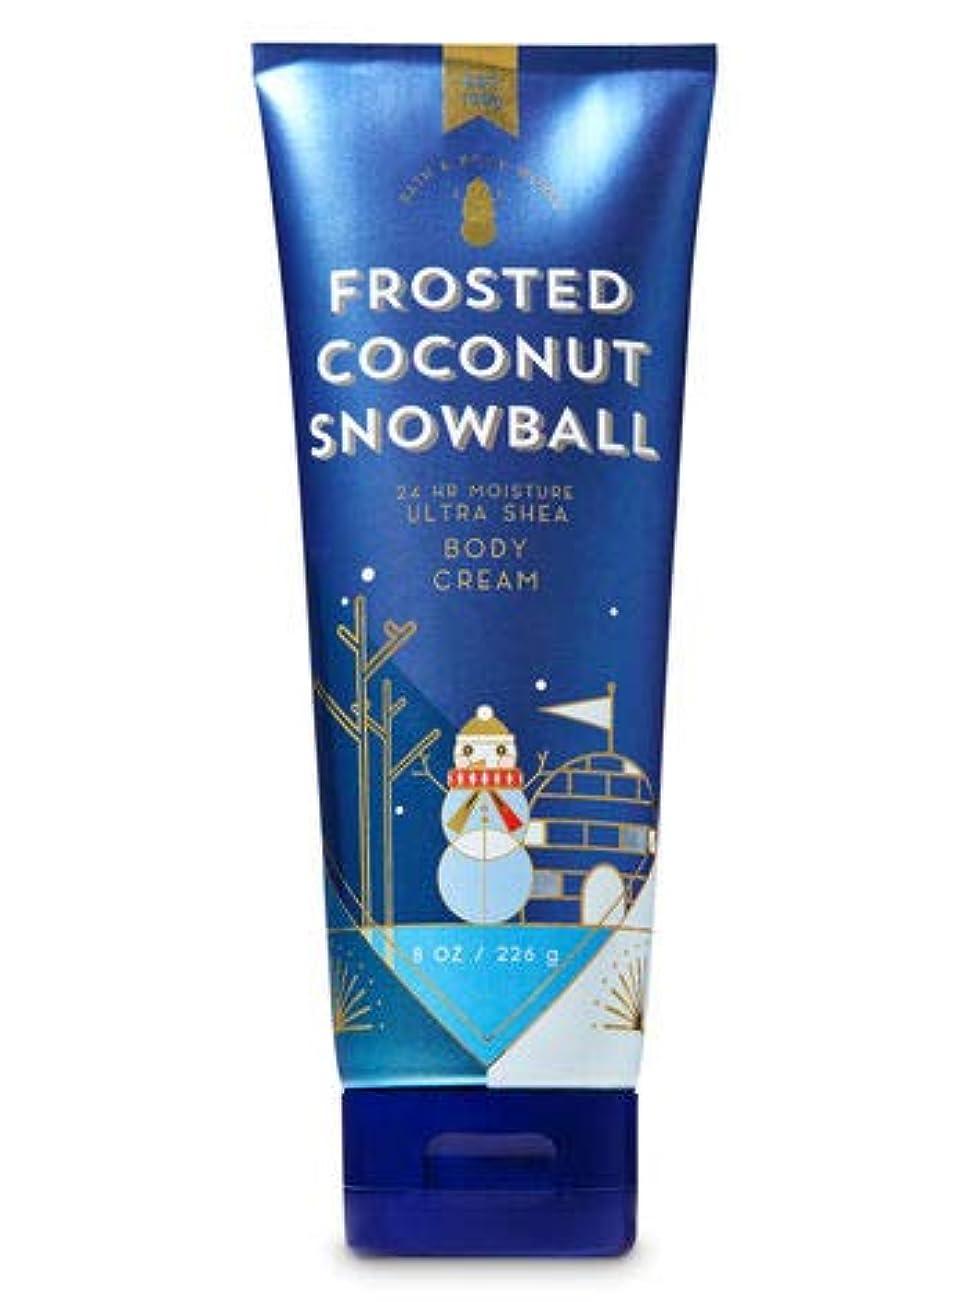 【Bath&Body Works/バス&ボディワークス】 ボディクリーム Frosted フロステッドココナッツスノーボール Ultra Shea Body Cream Frosted Coconut Snowball 8 oz / 226 g [並行輸入品]